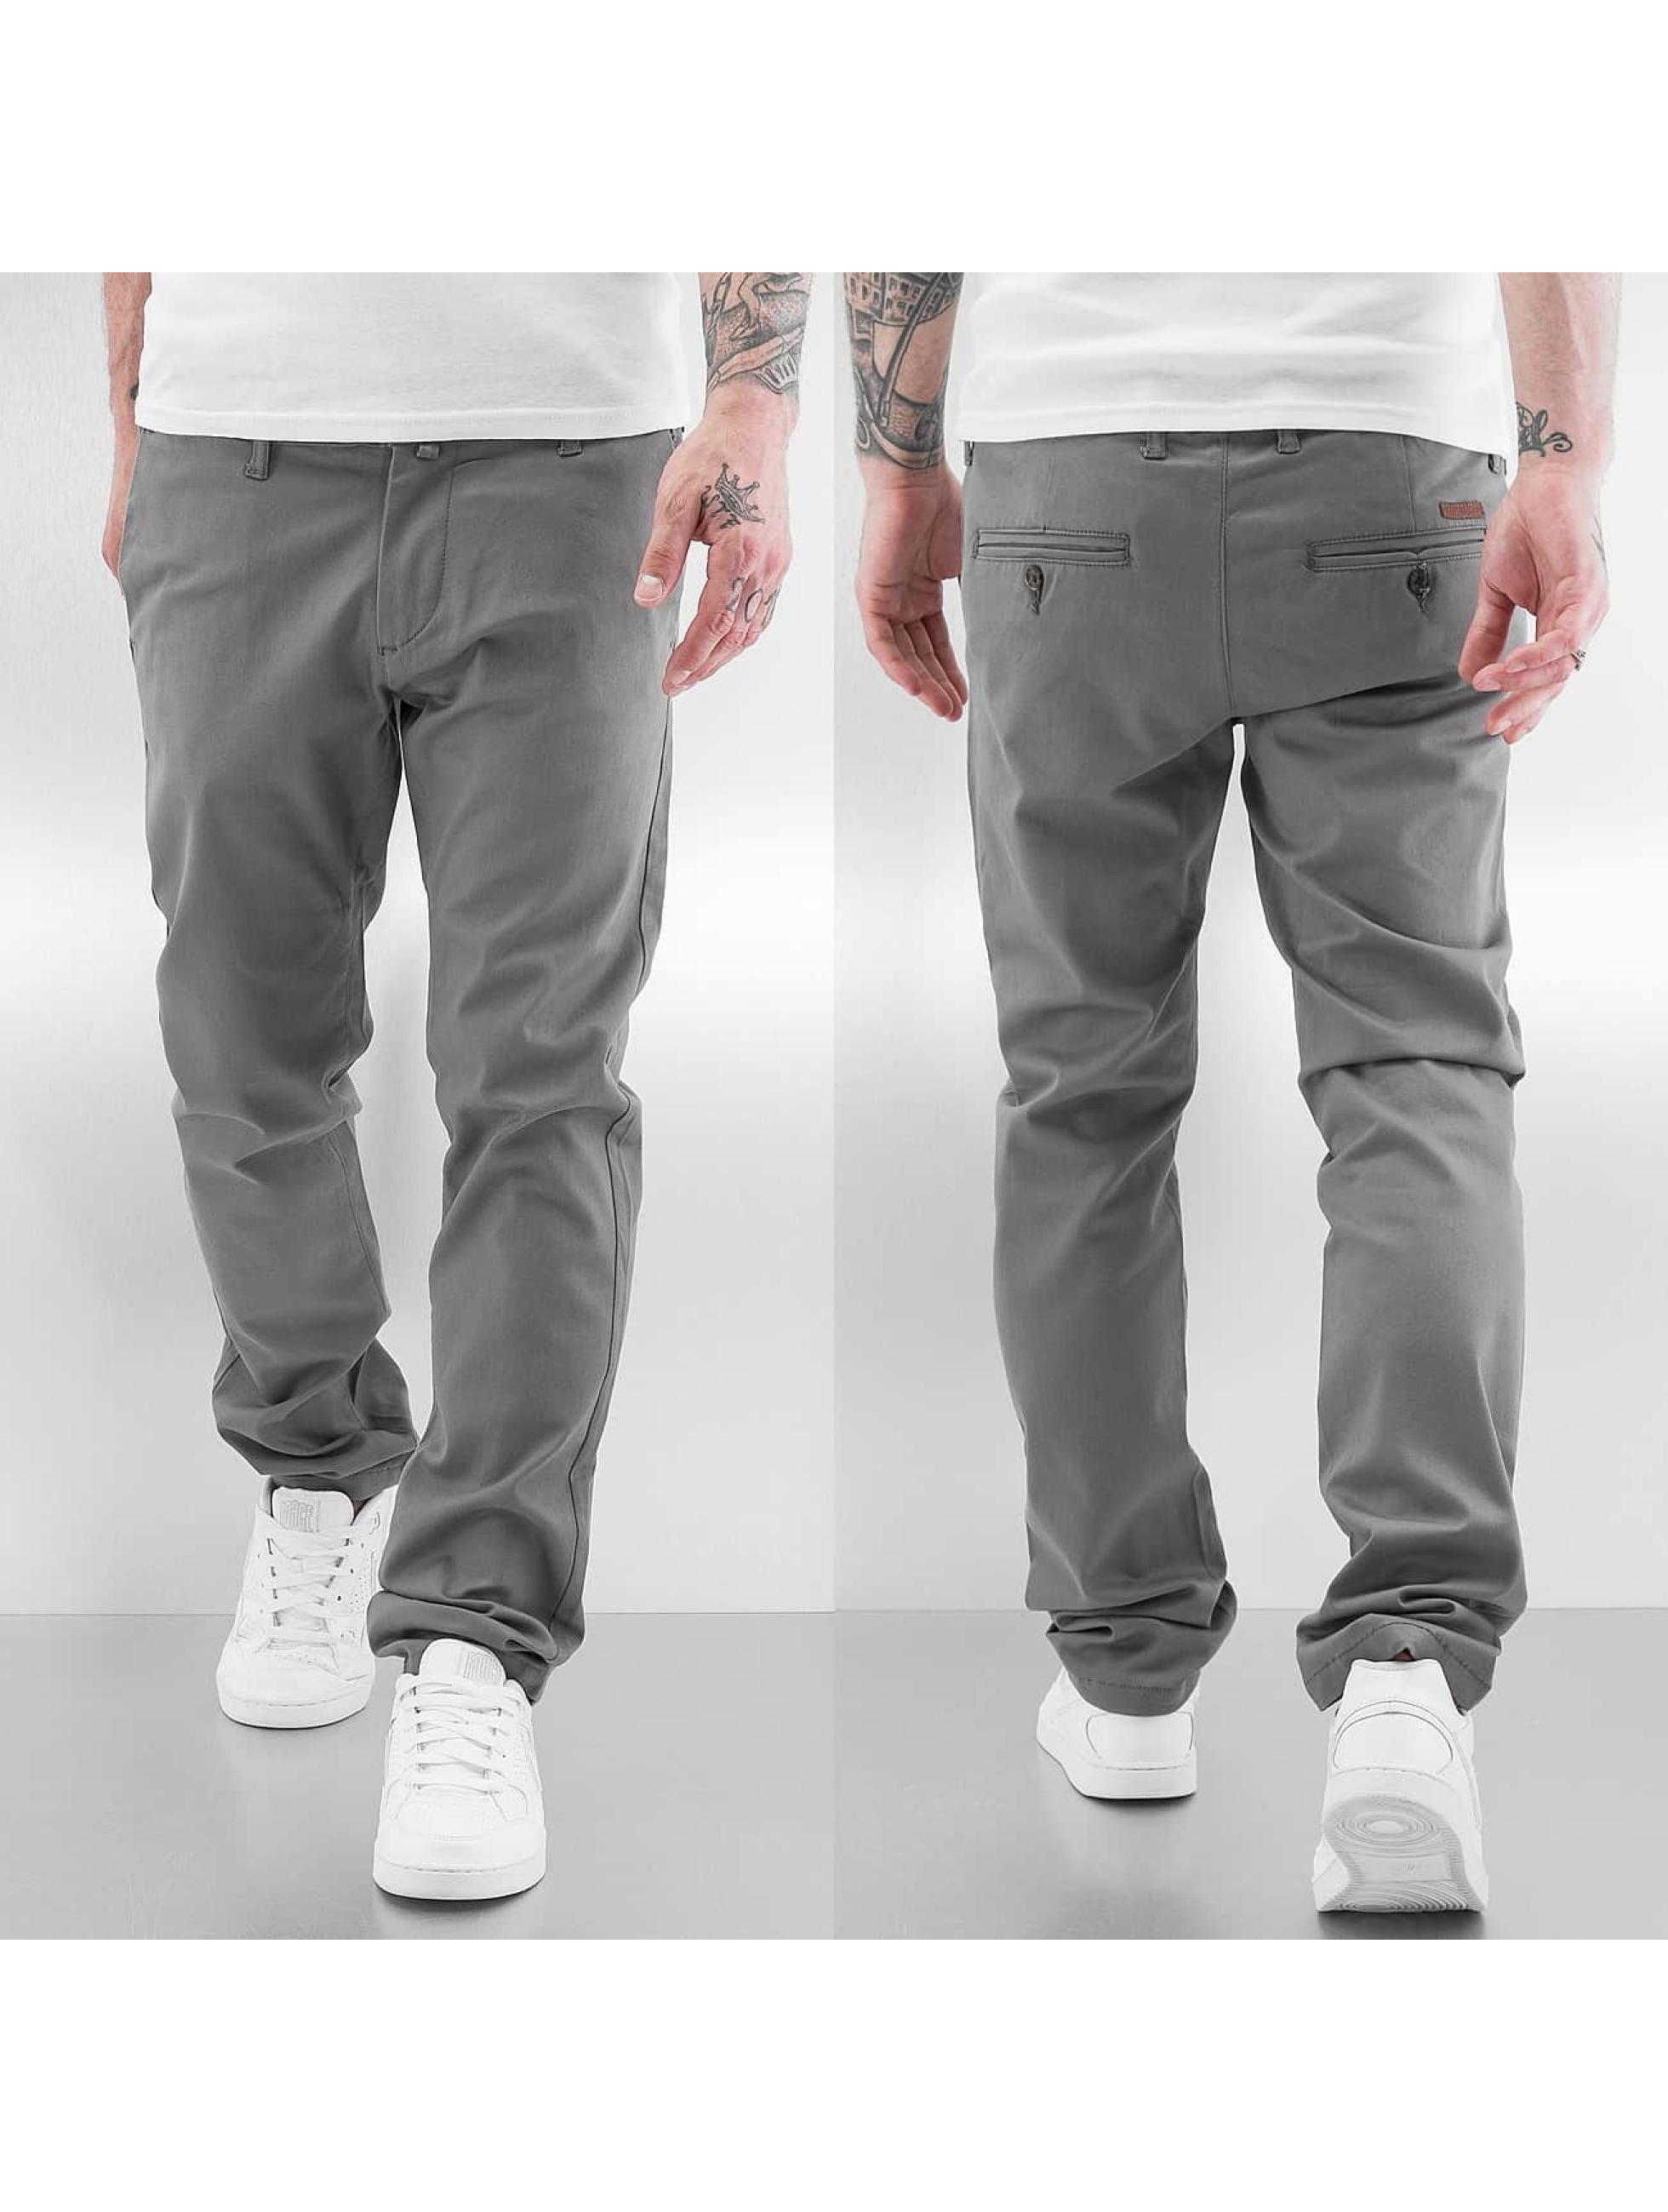 Rocawear Chino Slim Fit grau